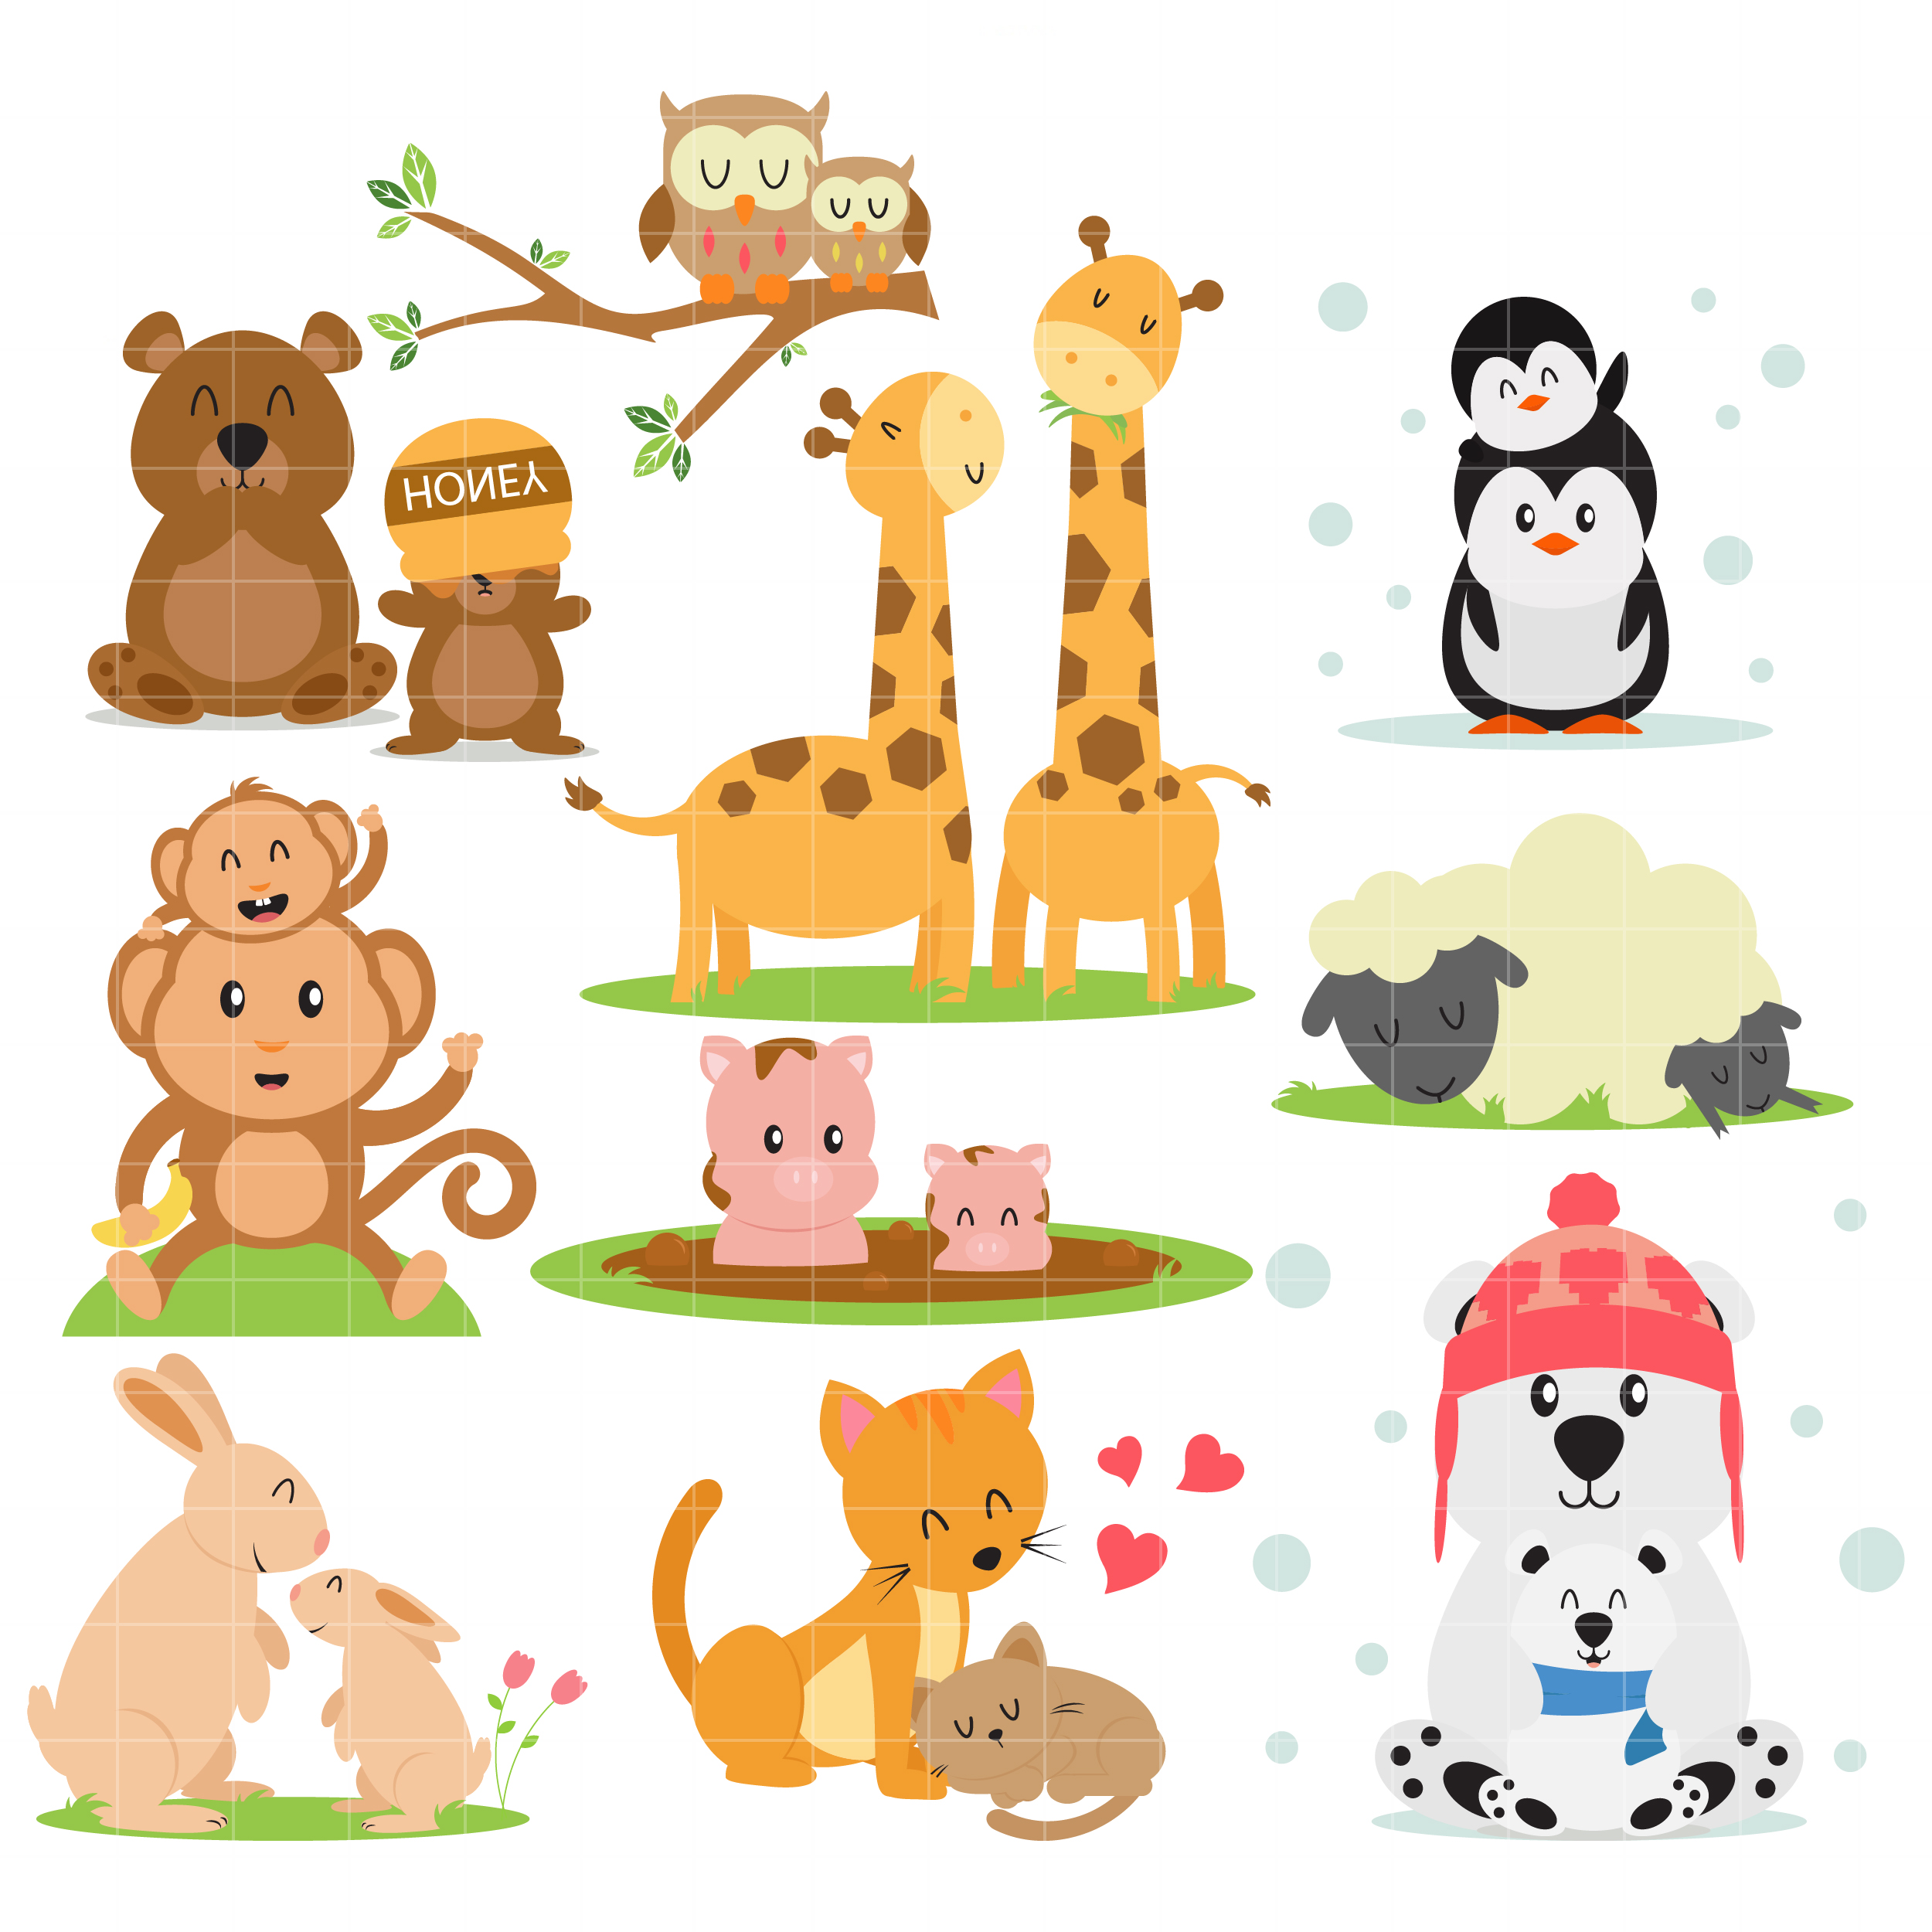 Pet clipart 10 animal. Families arts set semi